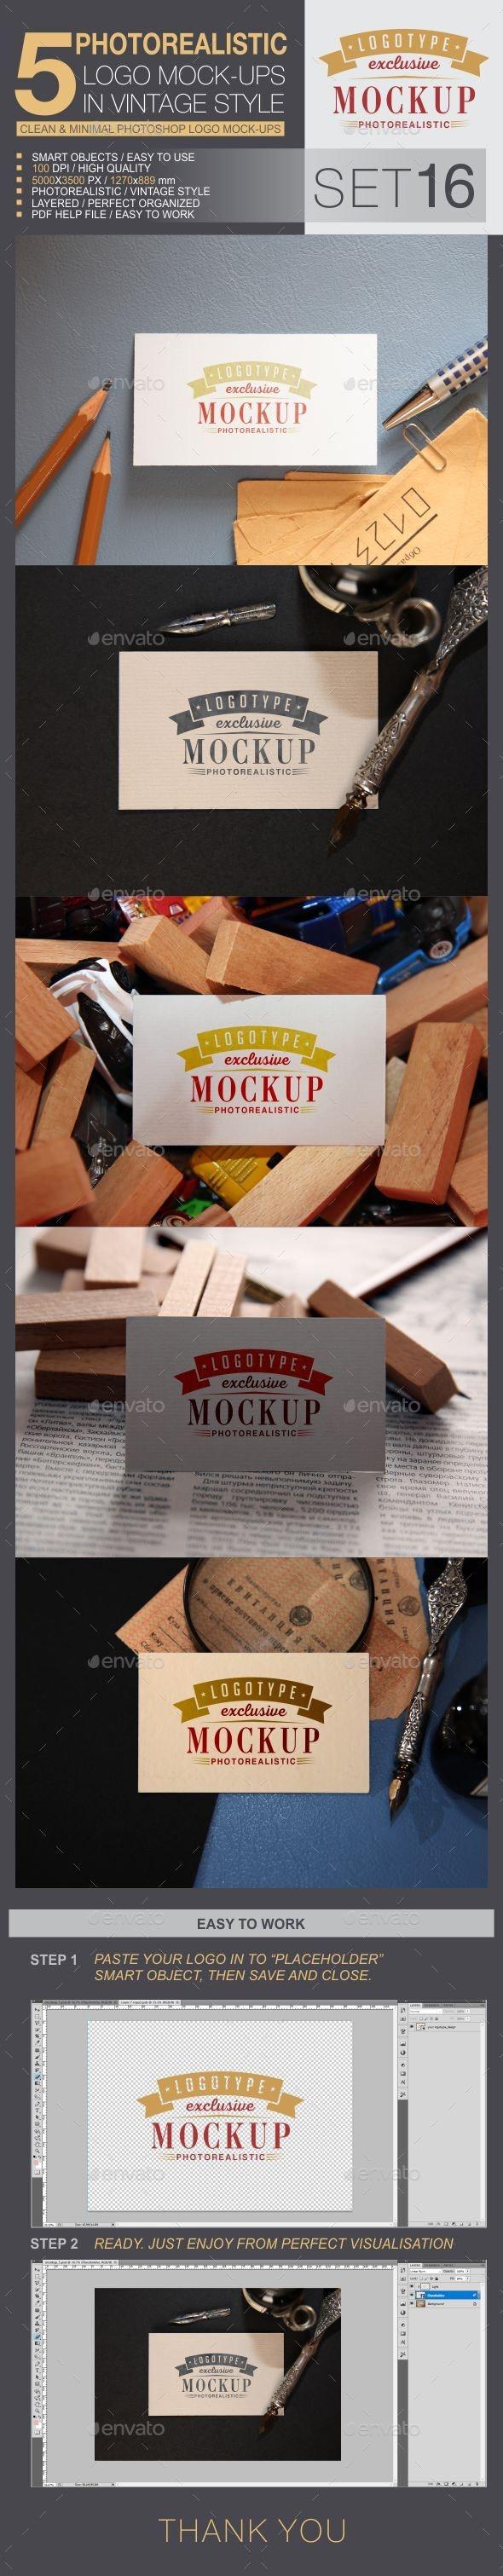 5 Logo Mock-Ups In Vintage Style - Set 16 - Logo Product Mock-Ups